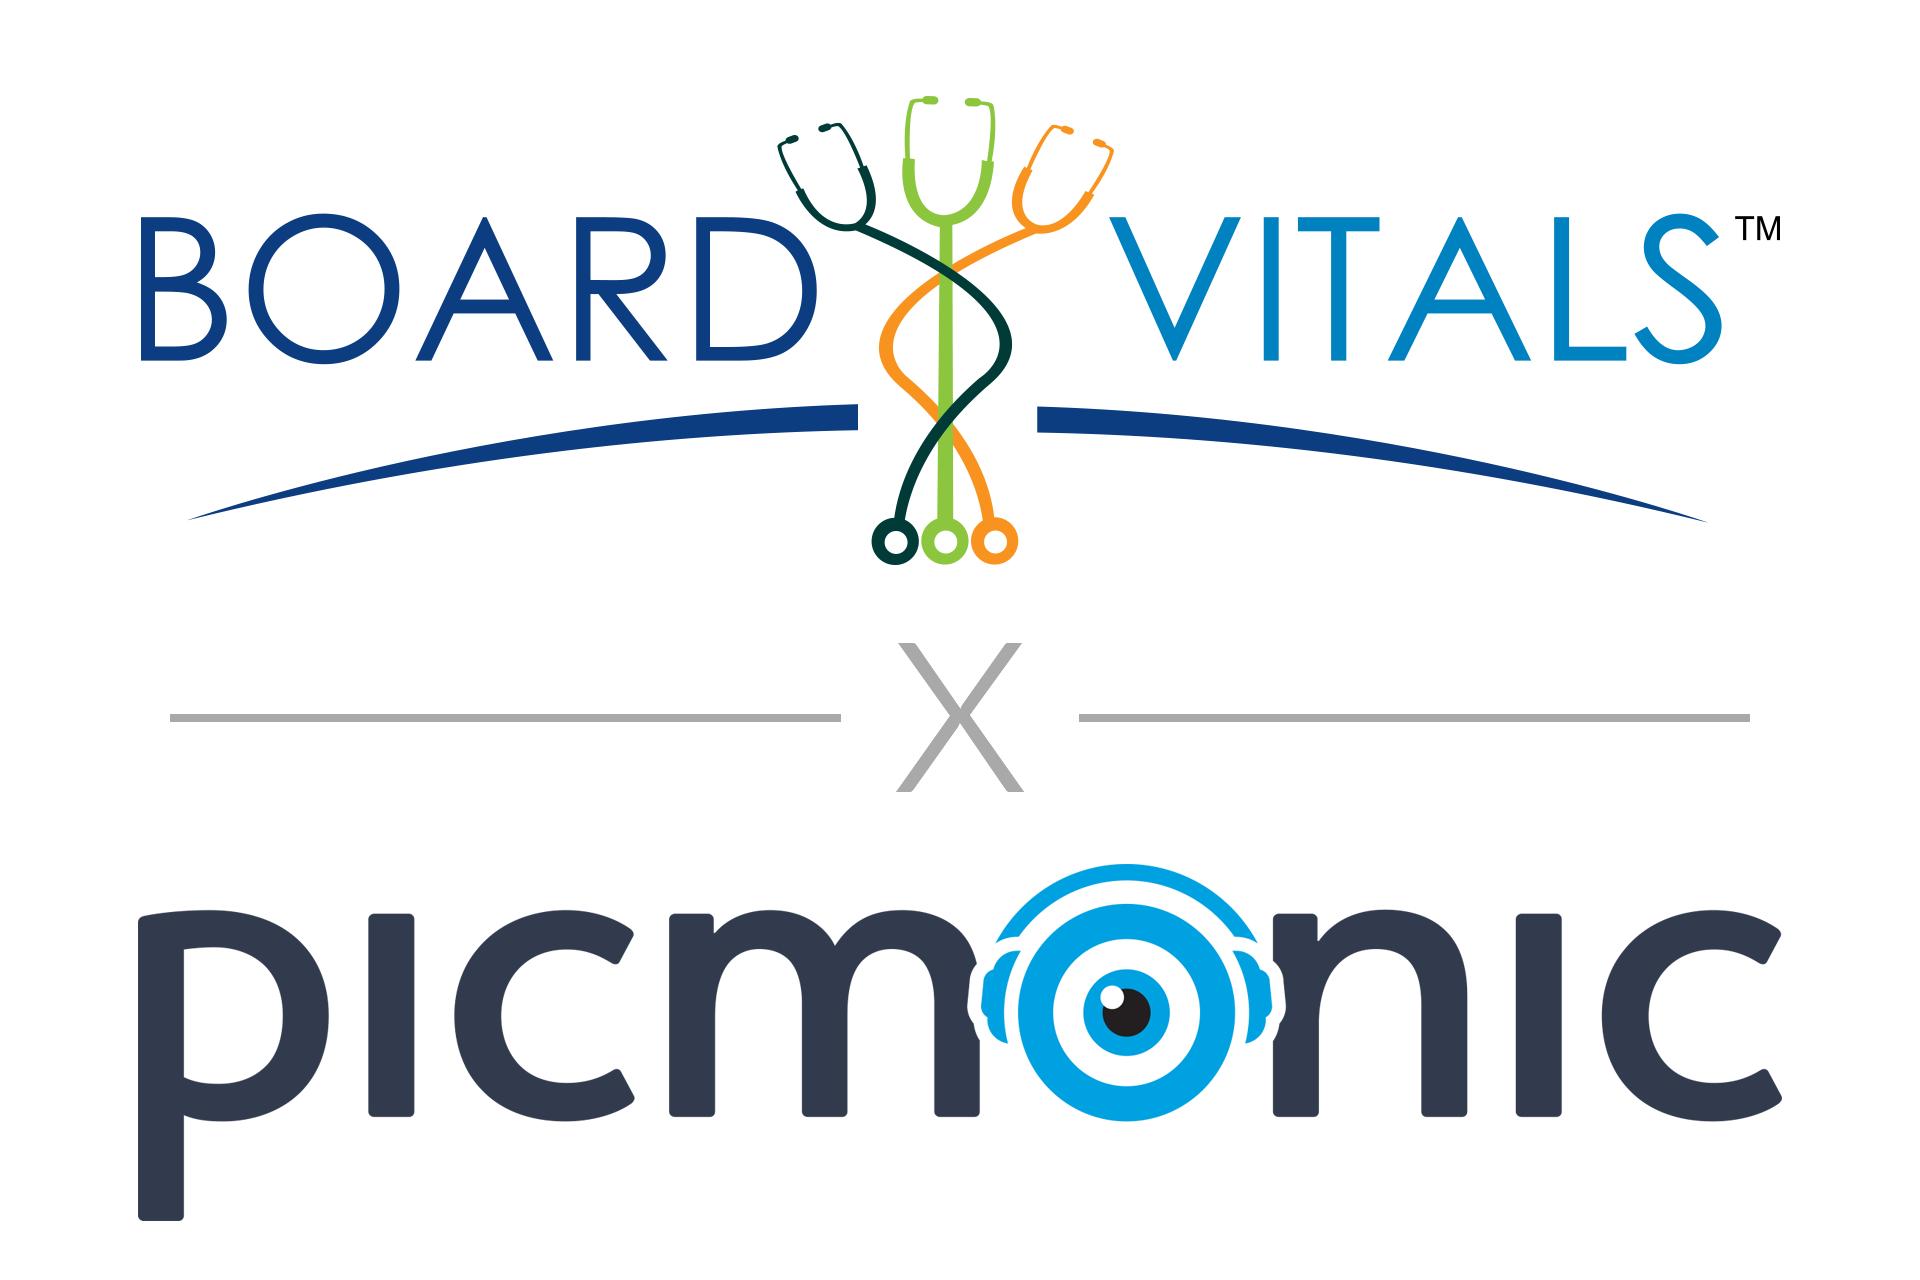 BoardVitals & Picmonic: The Complete NCLEX® Study Buddy